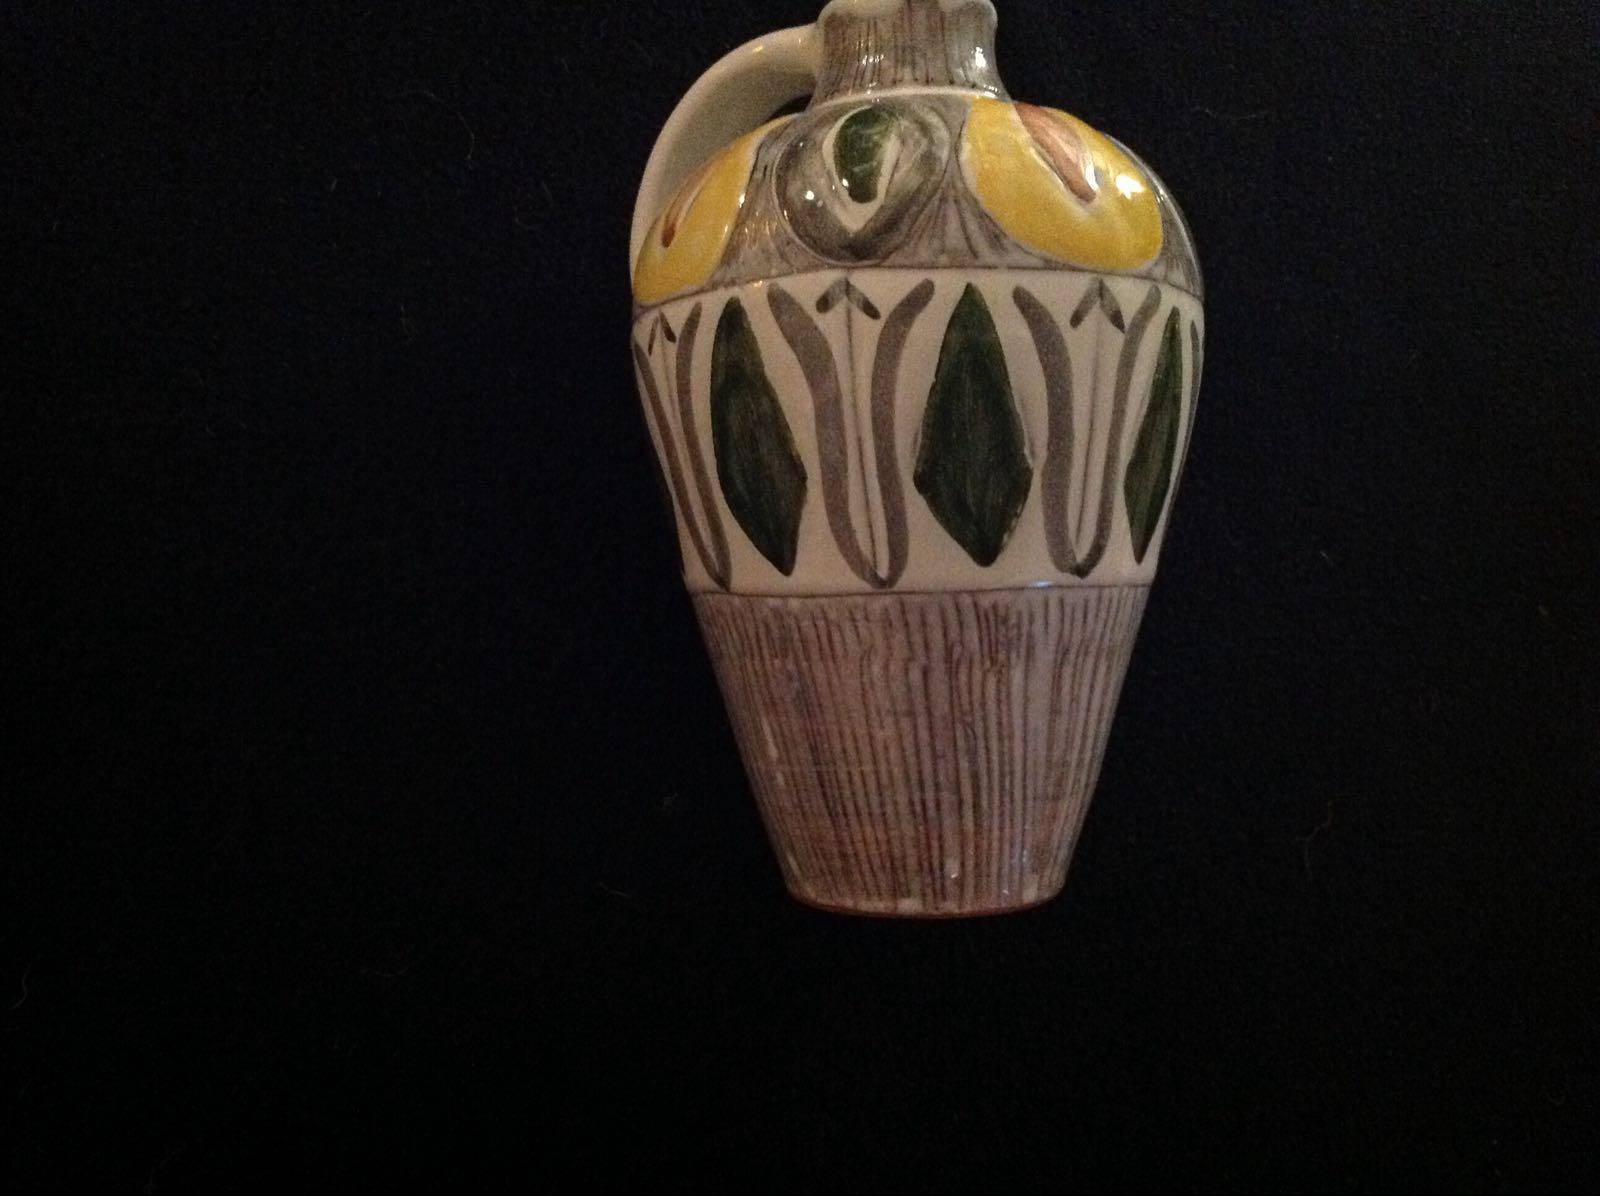 Vas (second hand, vintage, retro)